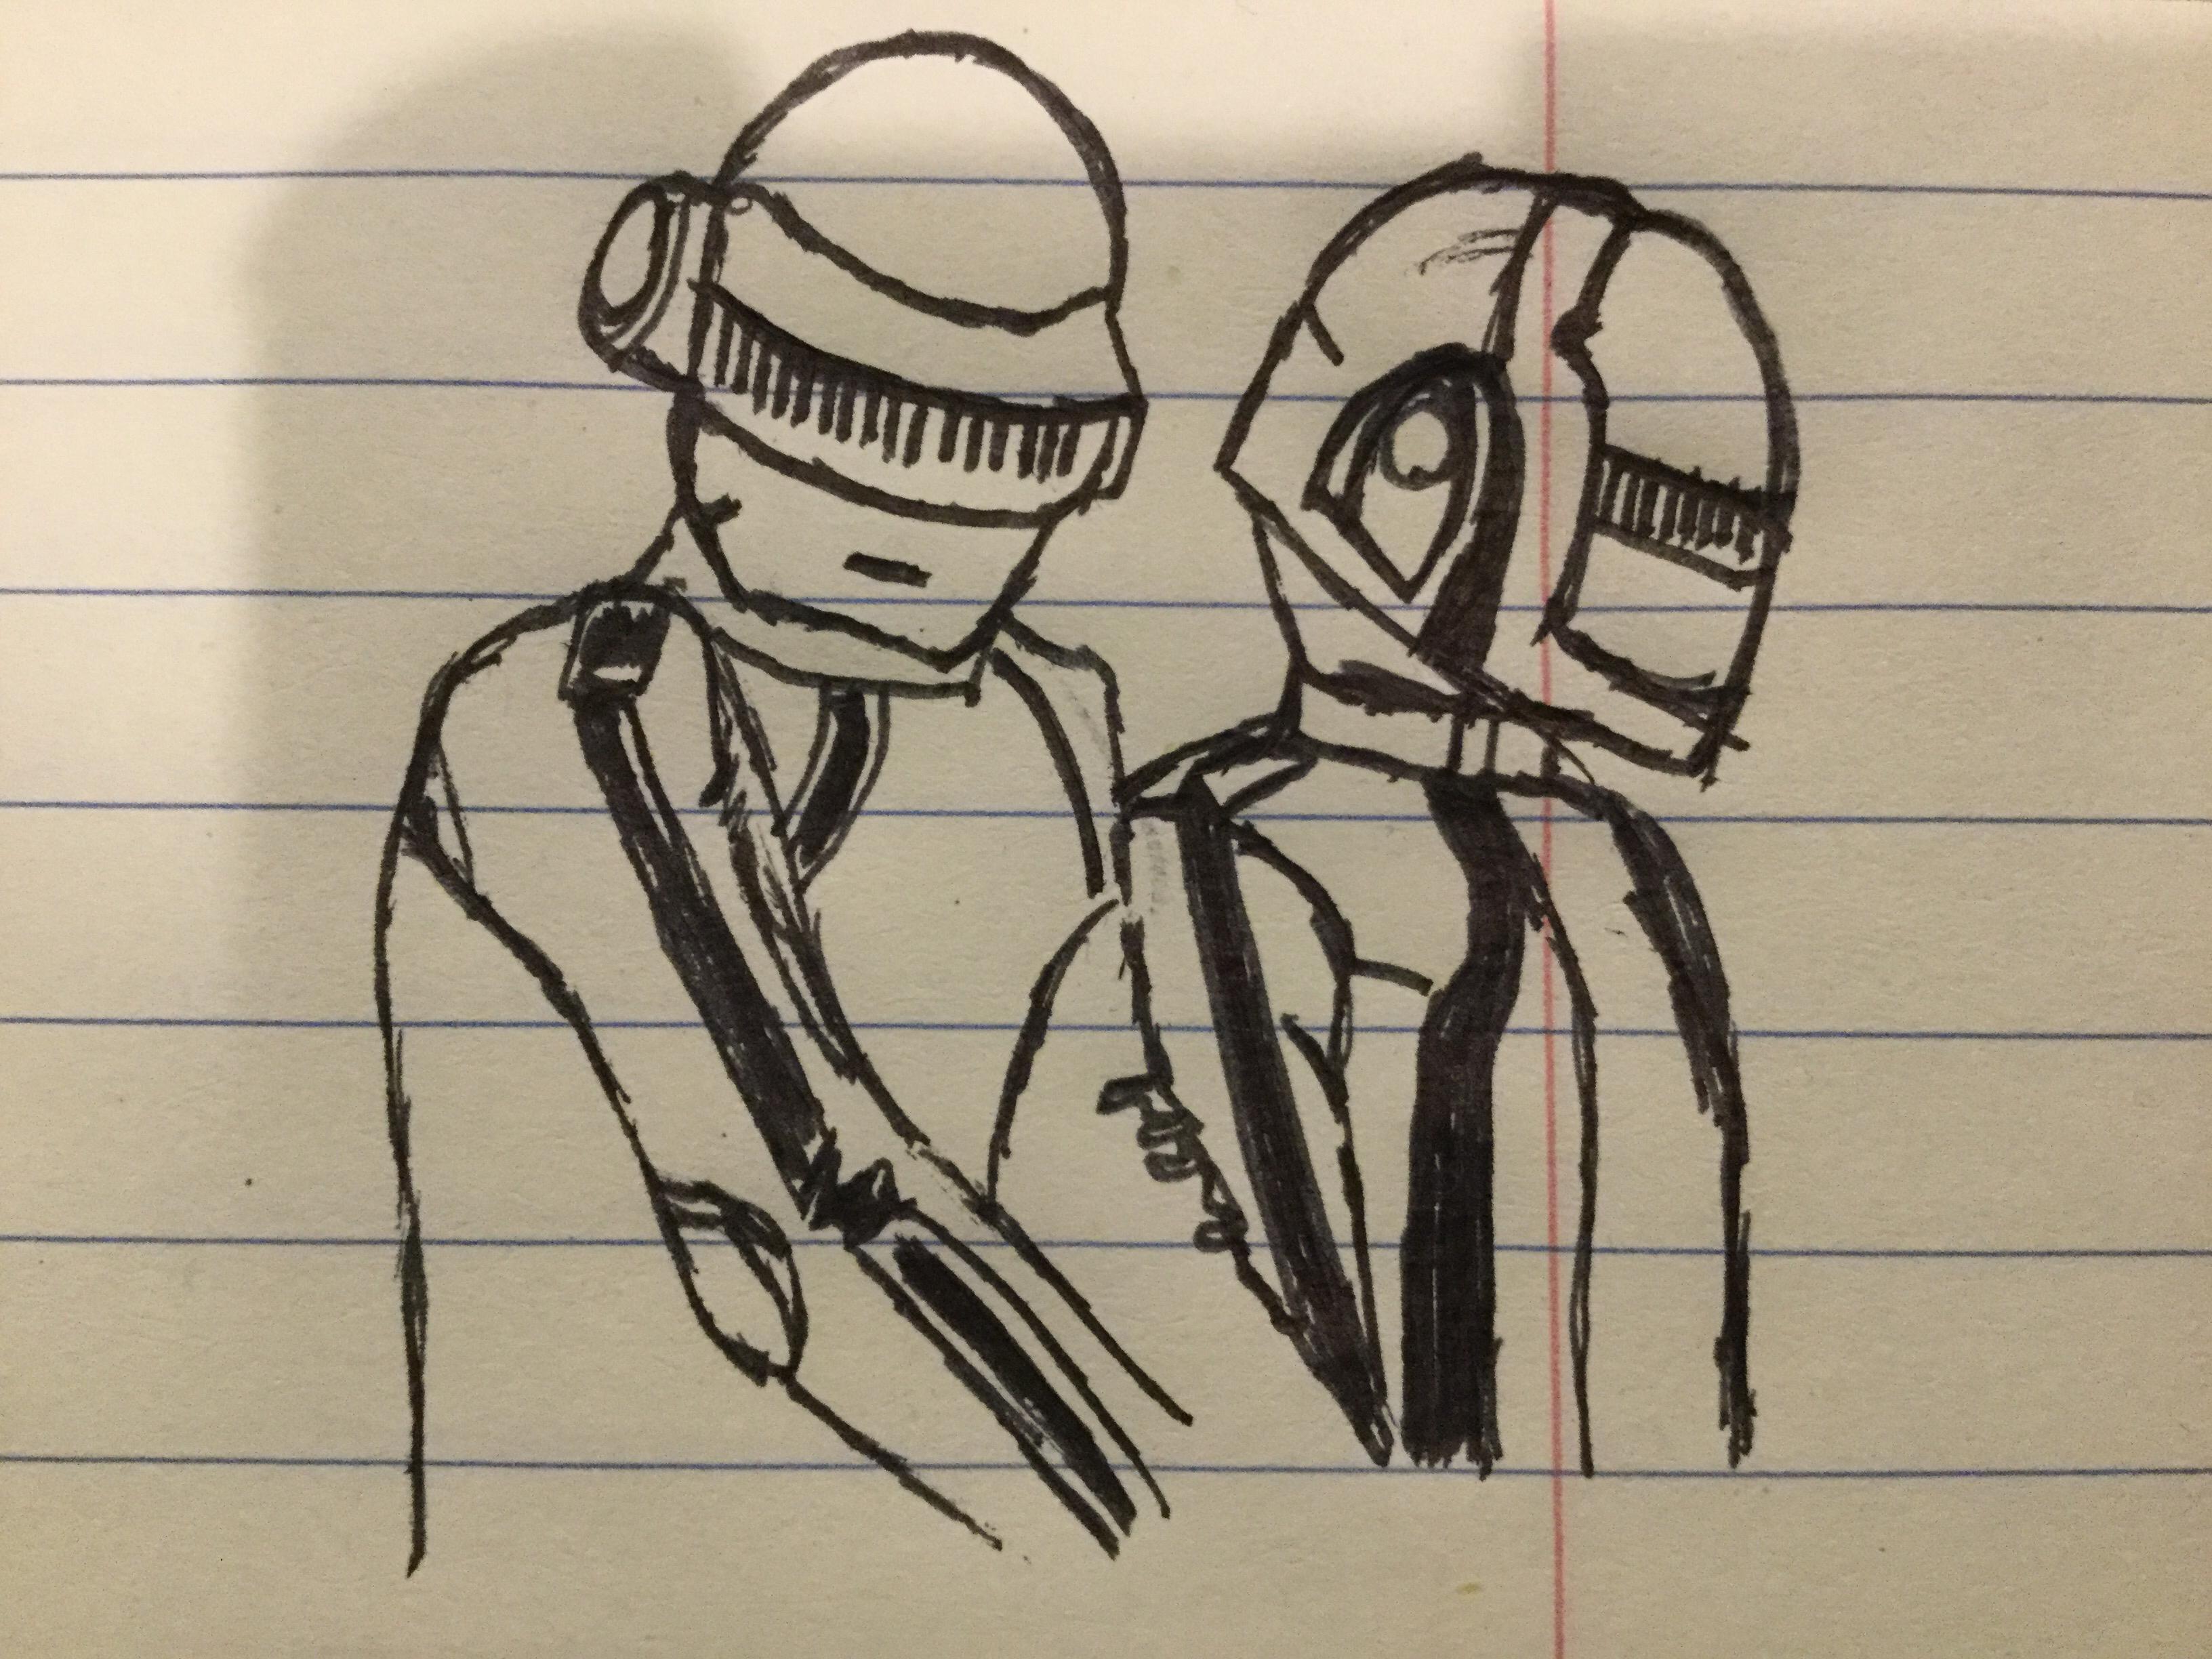 3264x2448 Daft Punk Tron Legacy Drawing Daftpunk